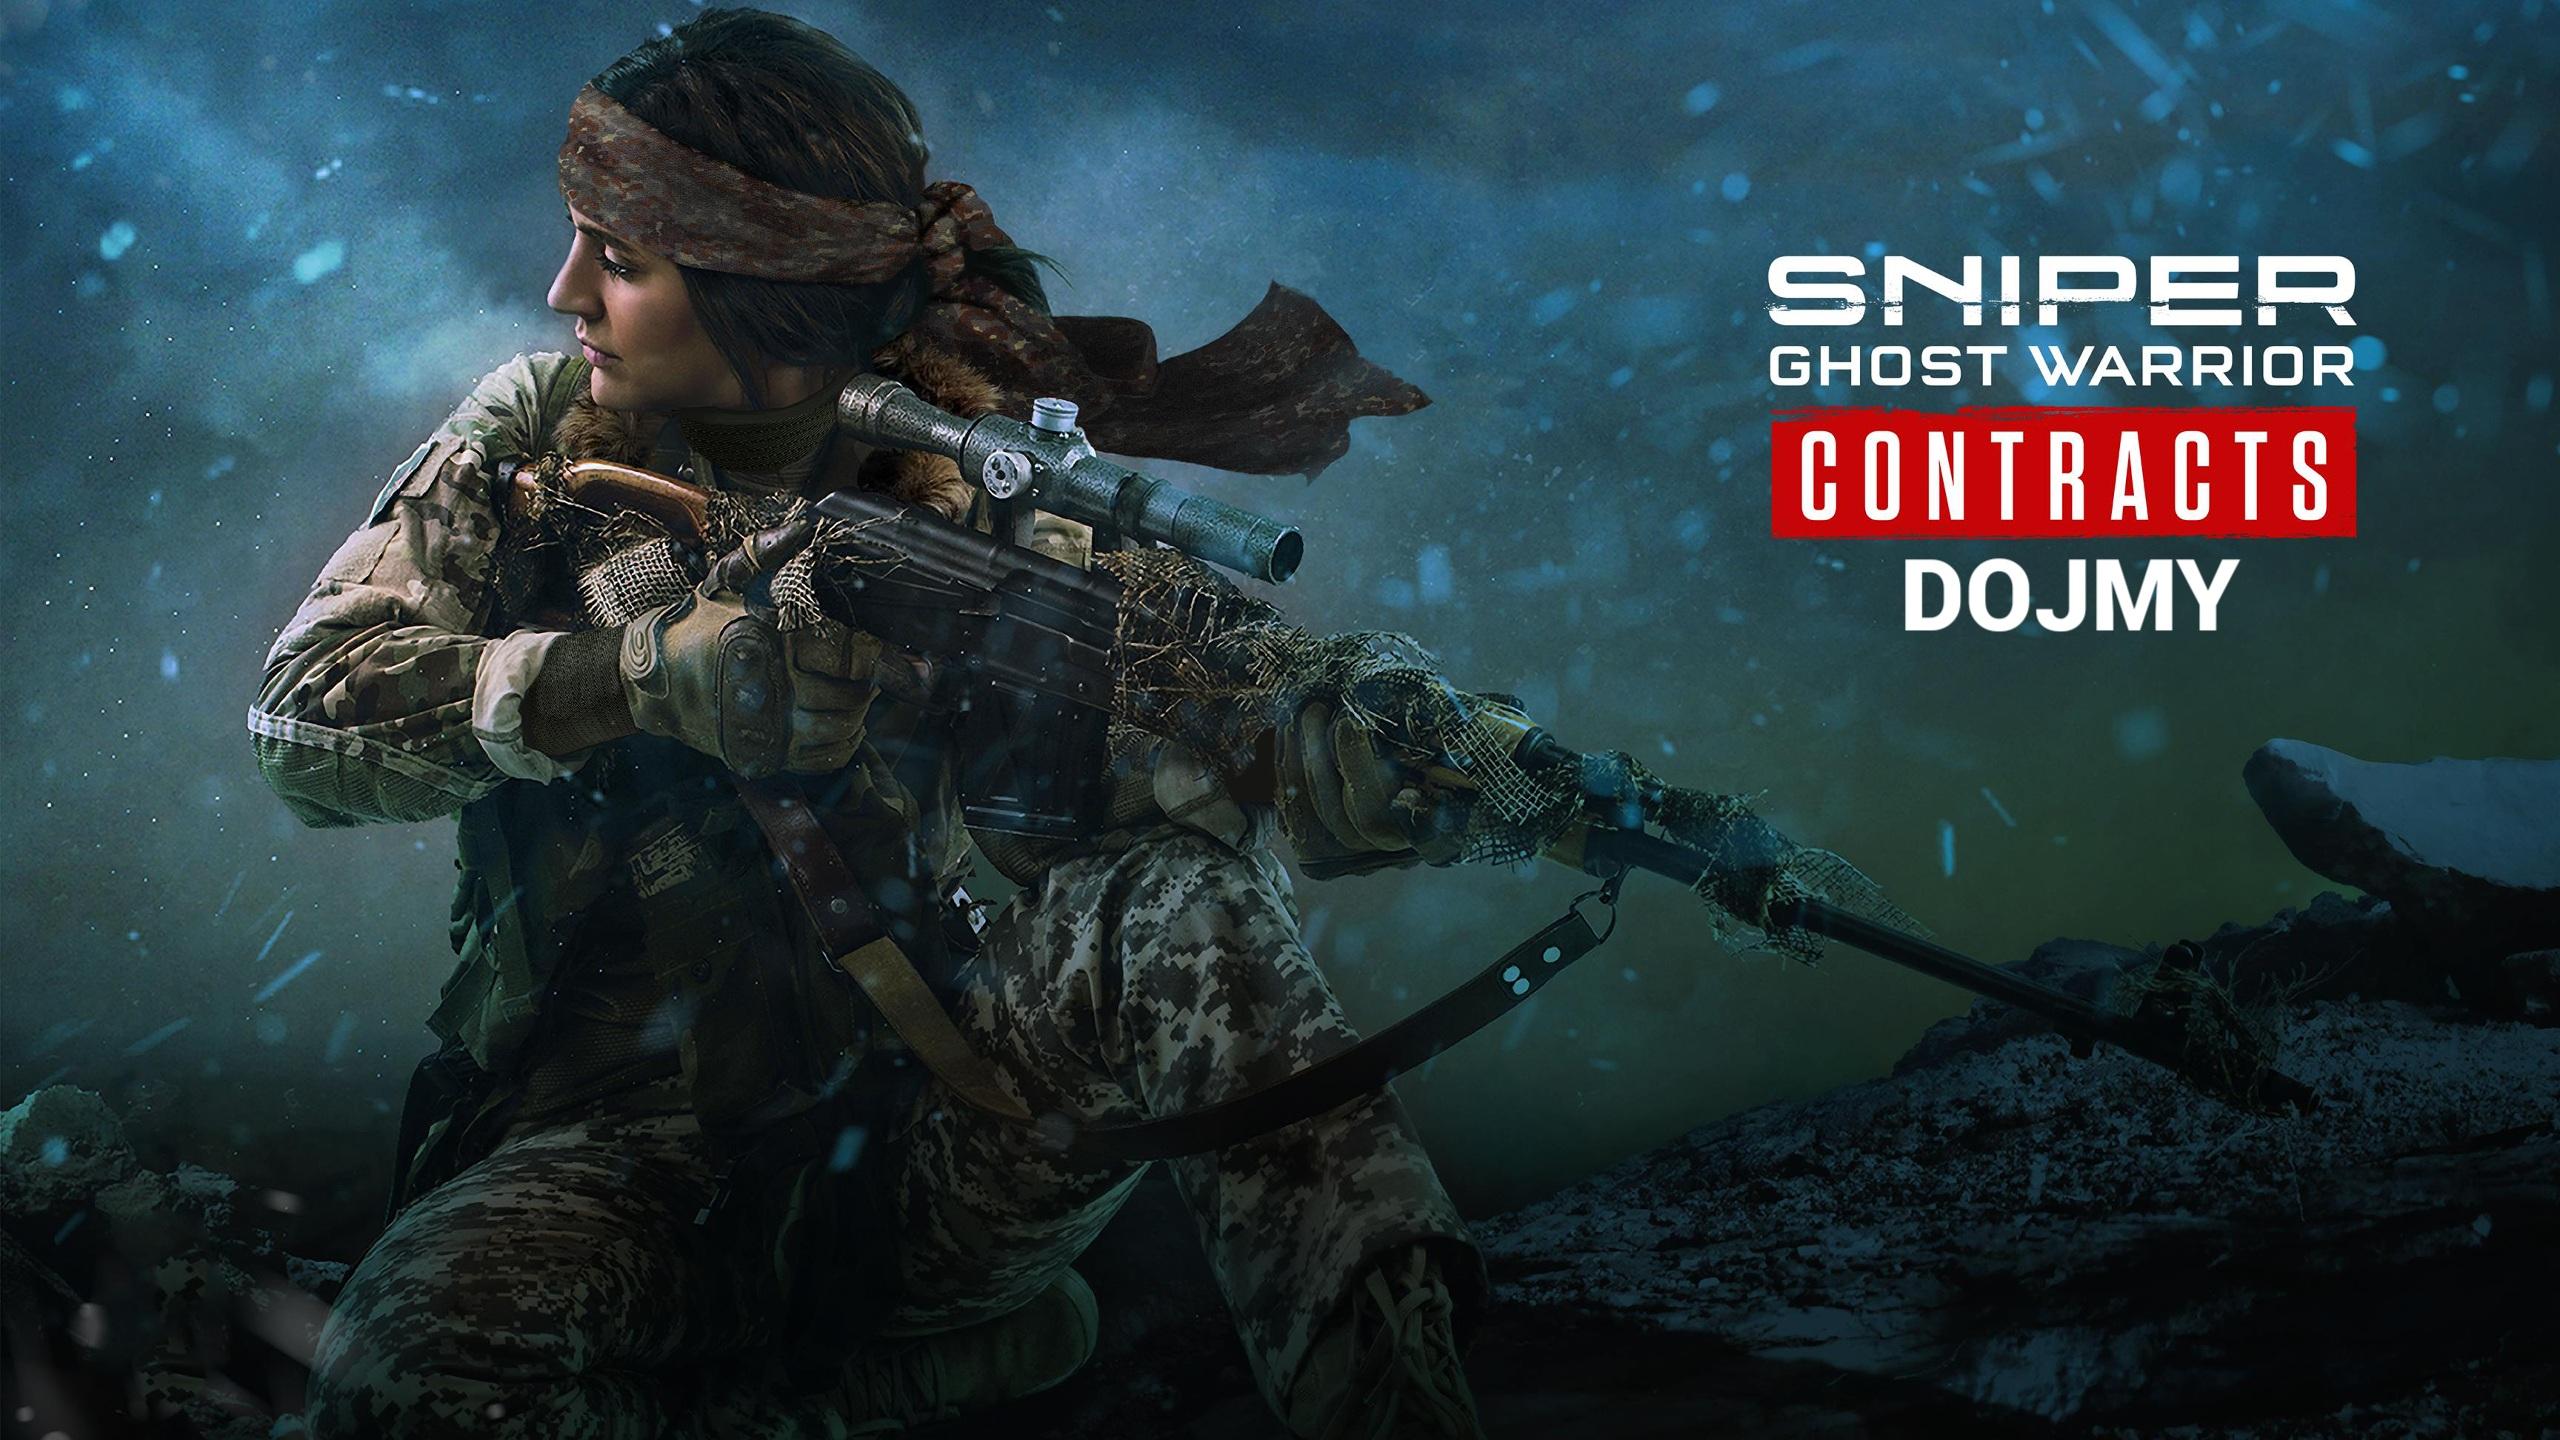 Sniper Ghost Warrior Contracts – Dojmy